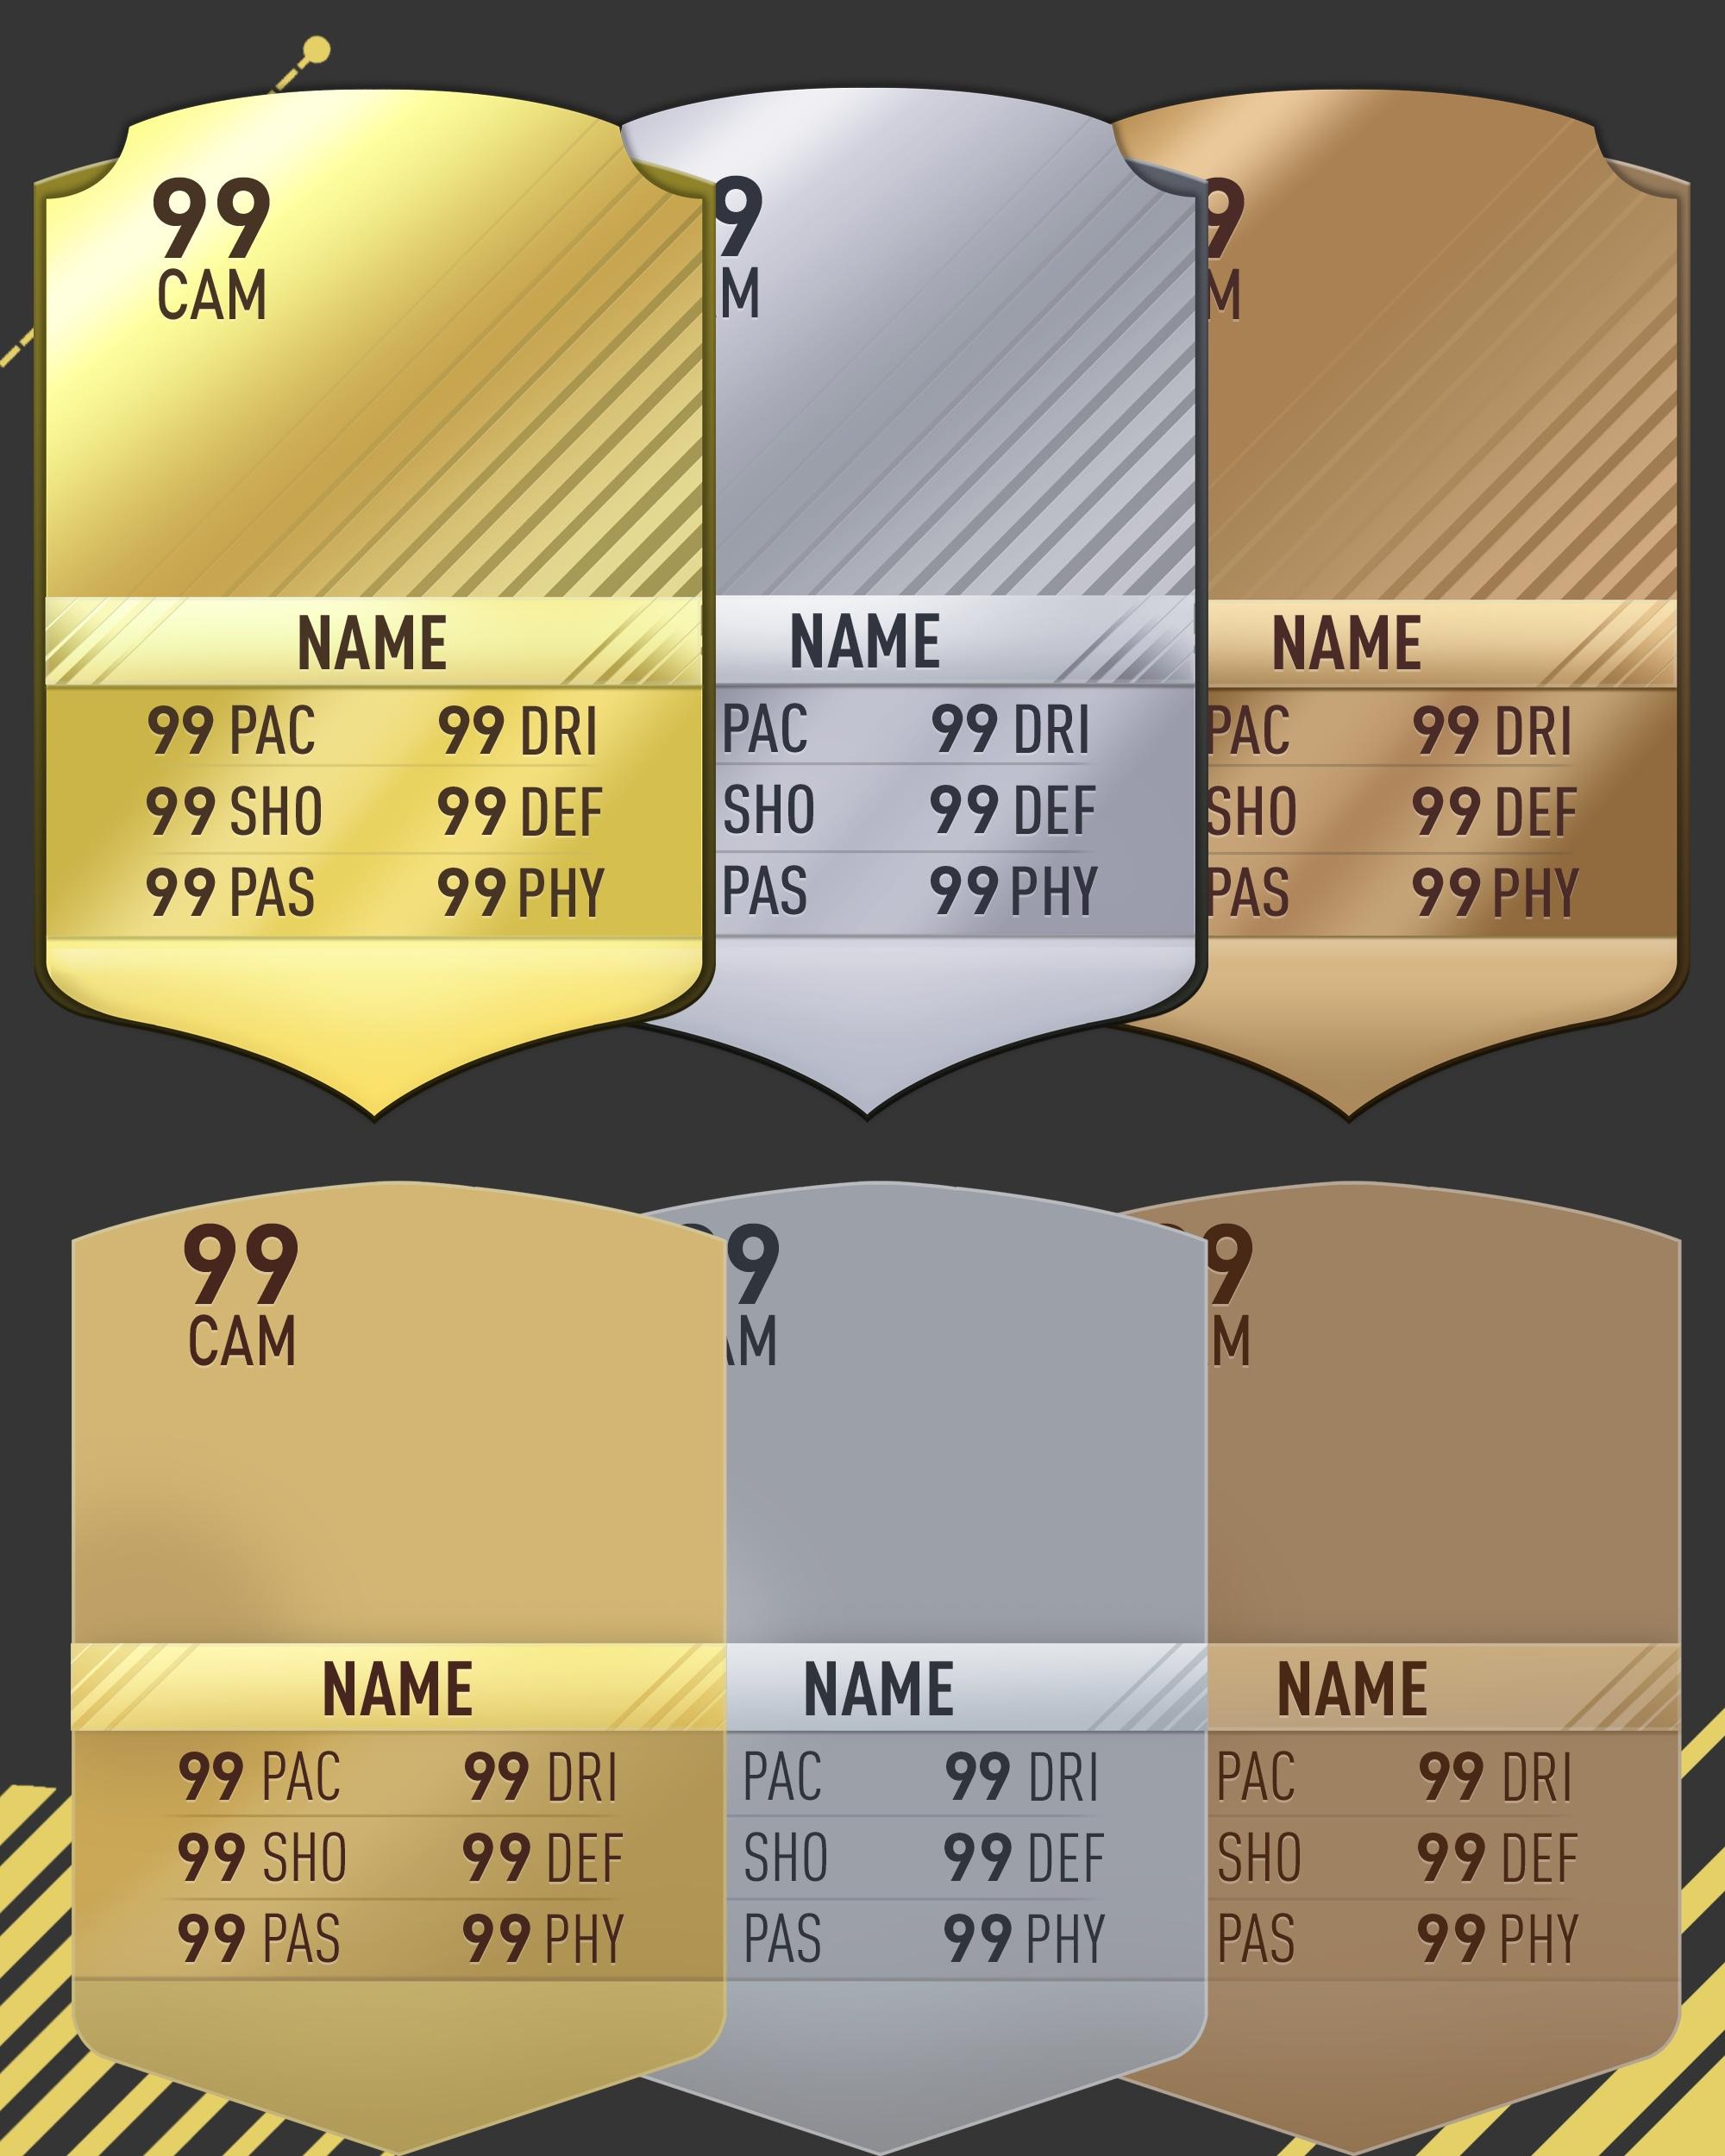 FIFA 17 RARE AND NON-RARE CARD TEMPLATE